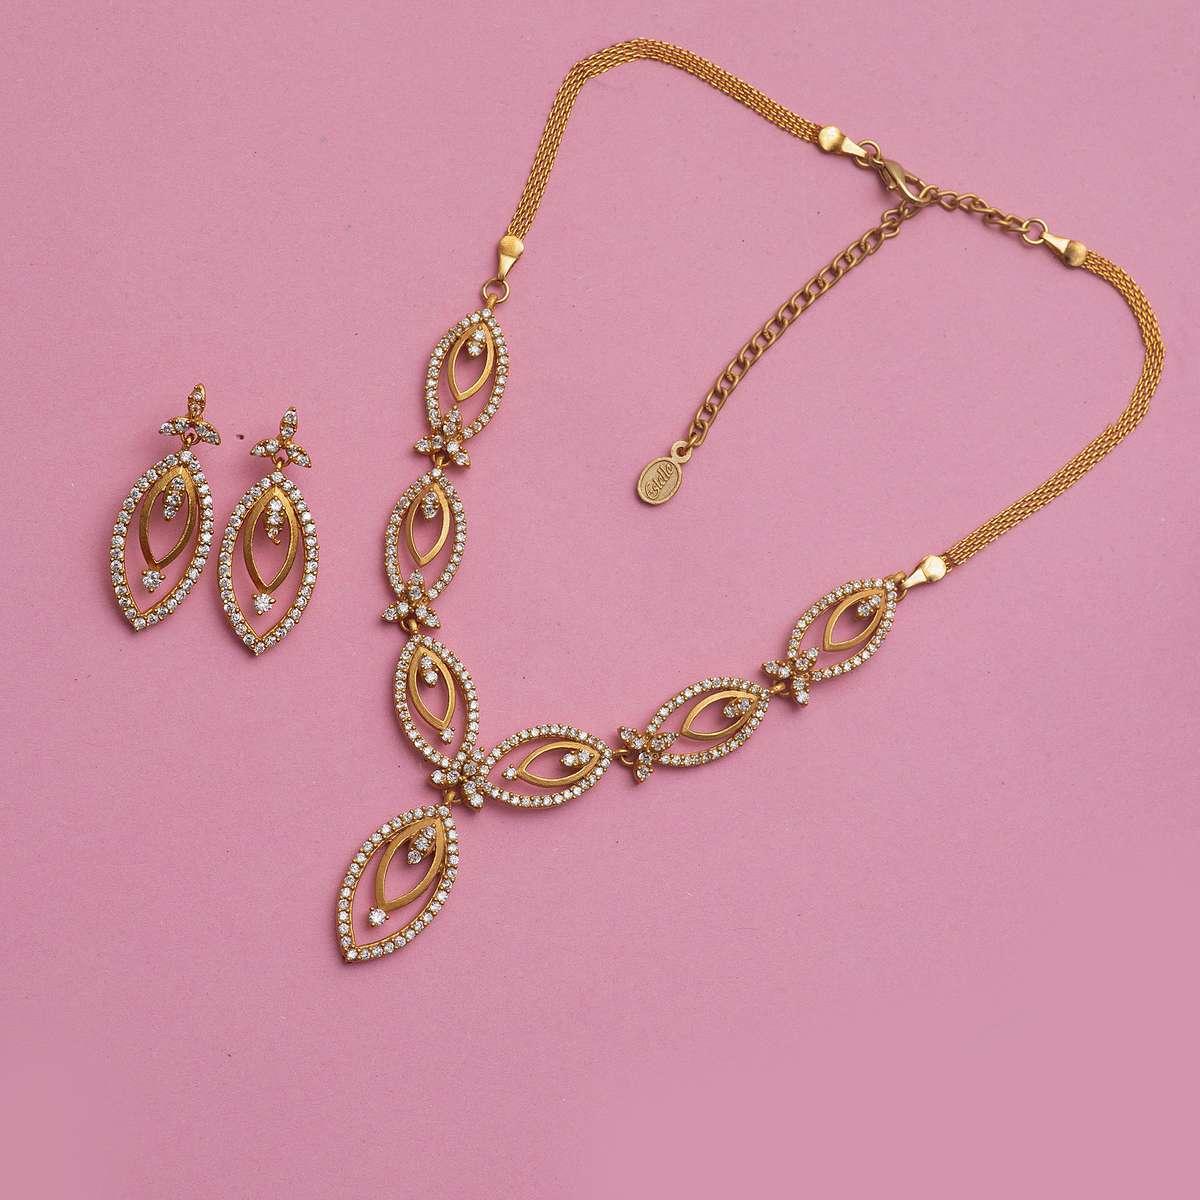 1.ESTELE Embellished Necklace and Earrings Set